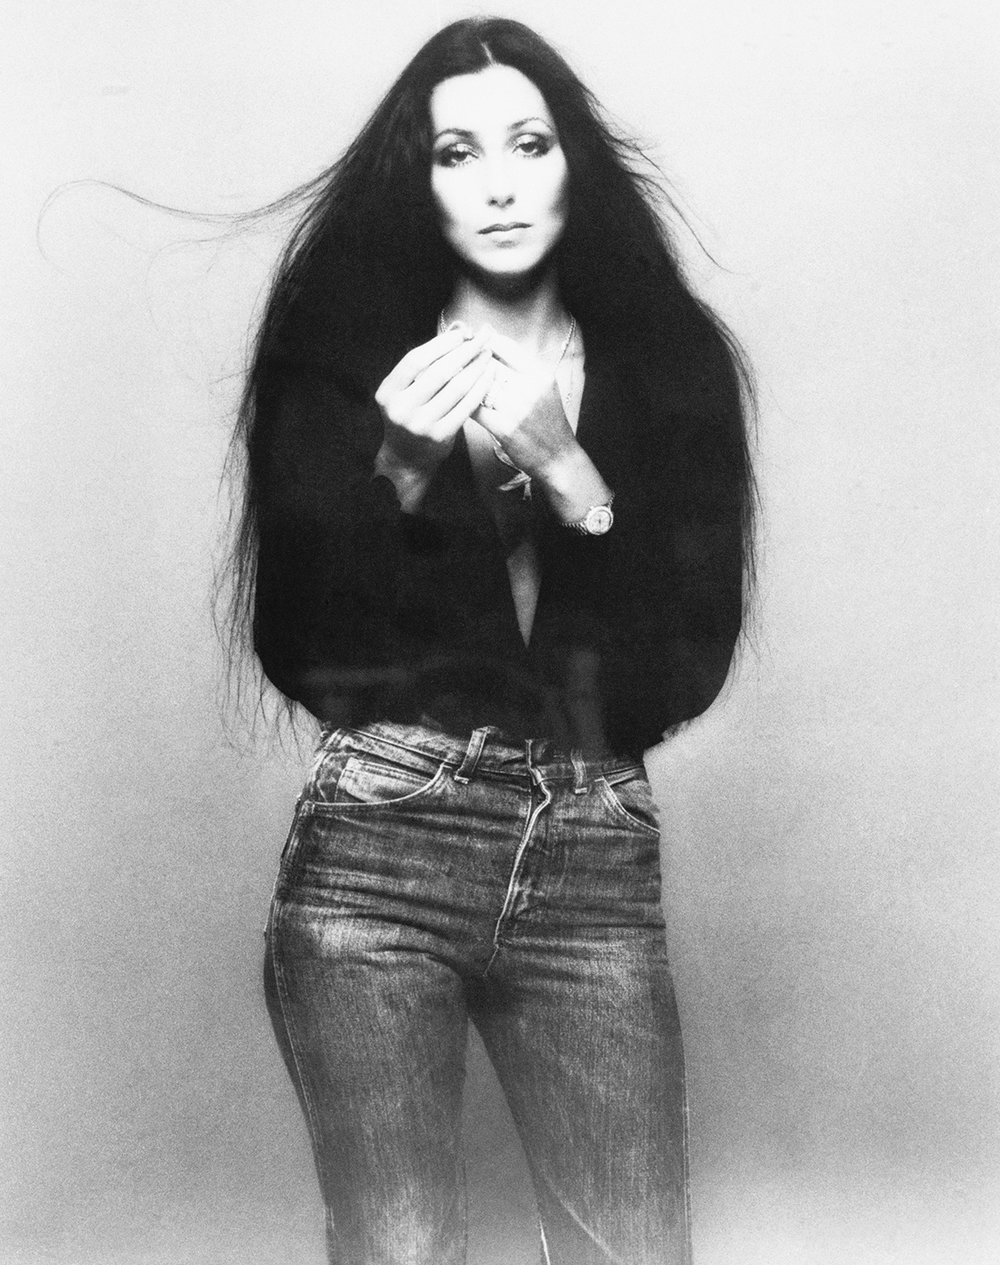 cher-jeans-1970s-billboard-1240.jpg